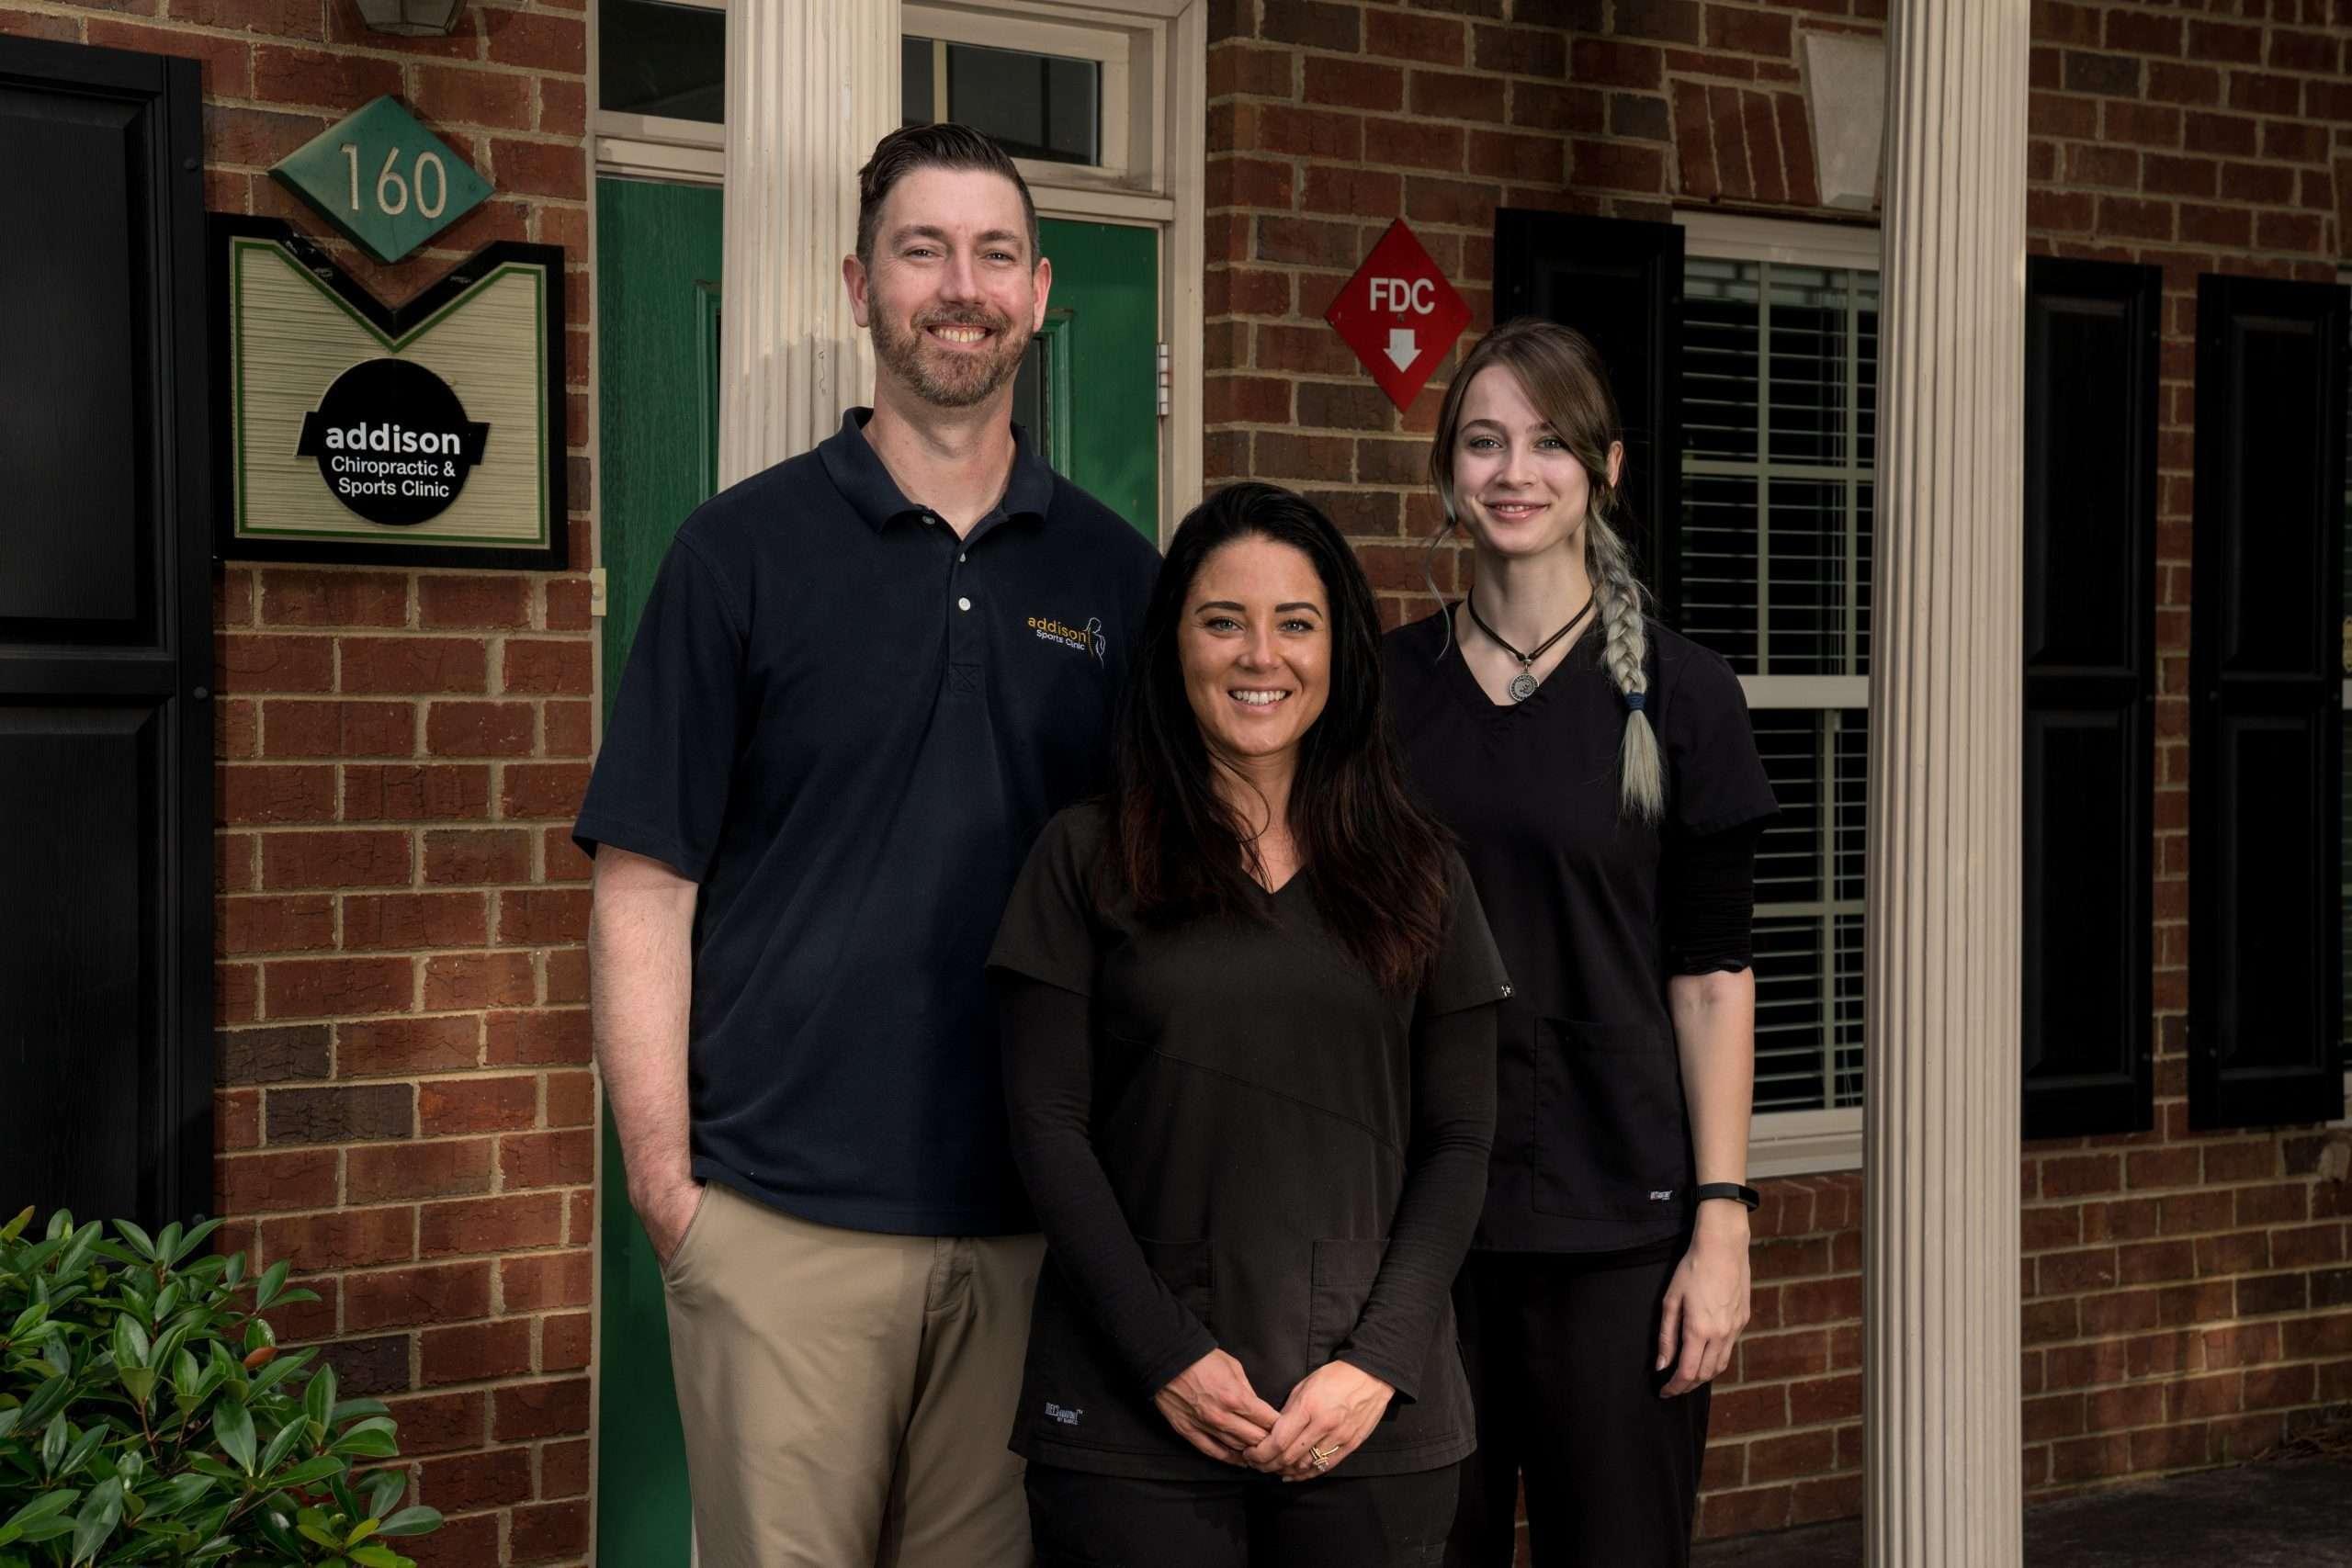 Addison Sports Clinic team